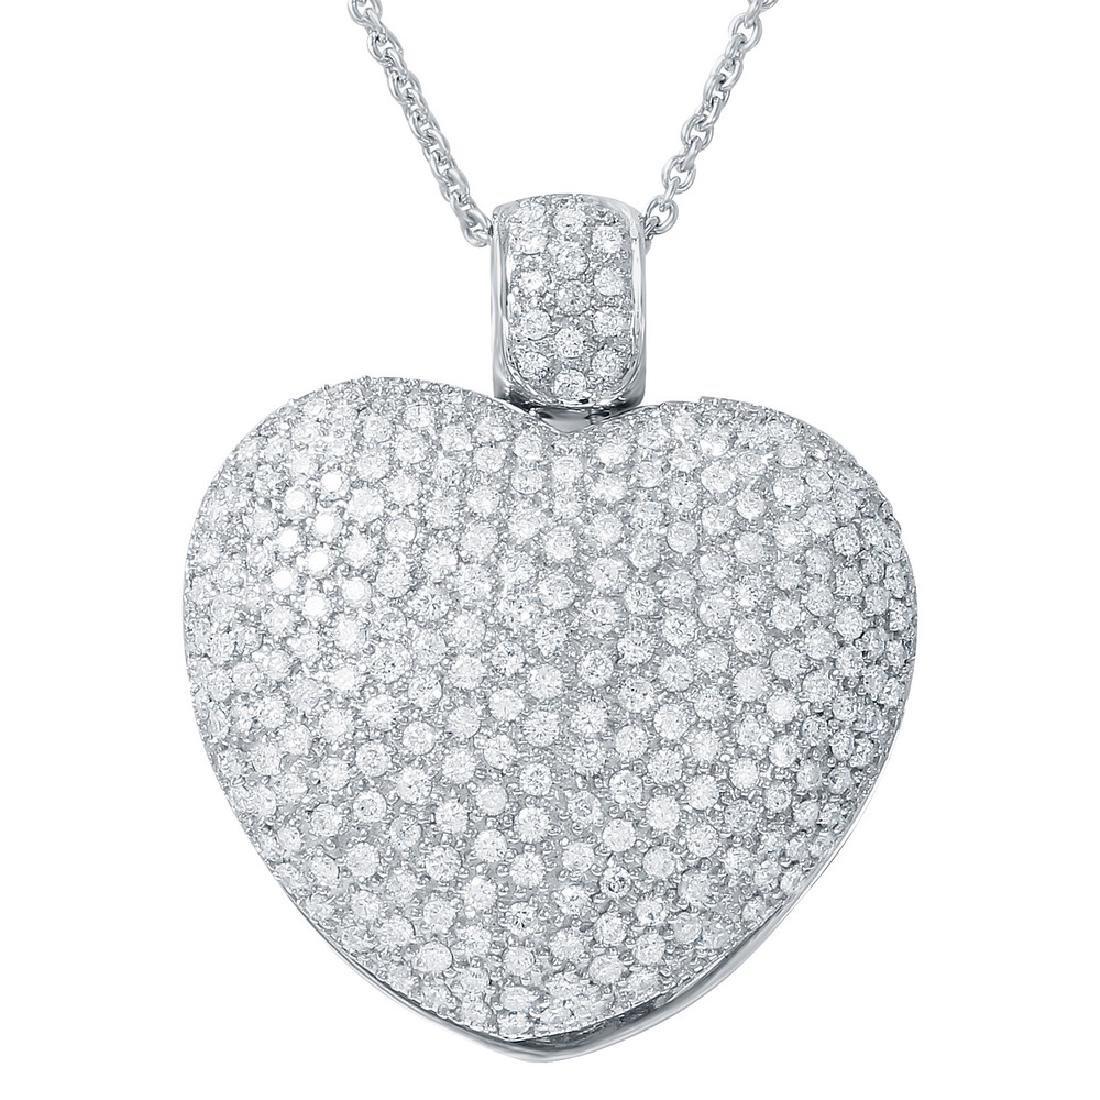 Genuine 5.11 TCW 18K White Gold Ladies Necklace